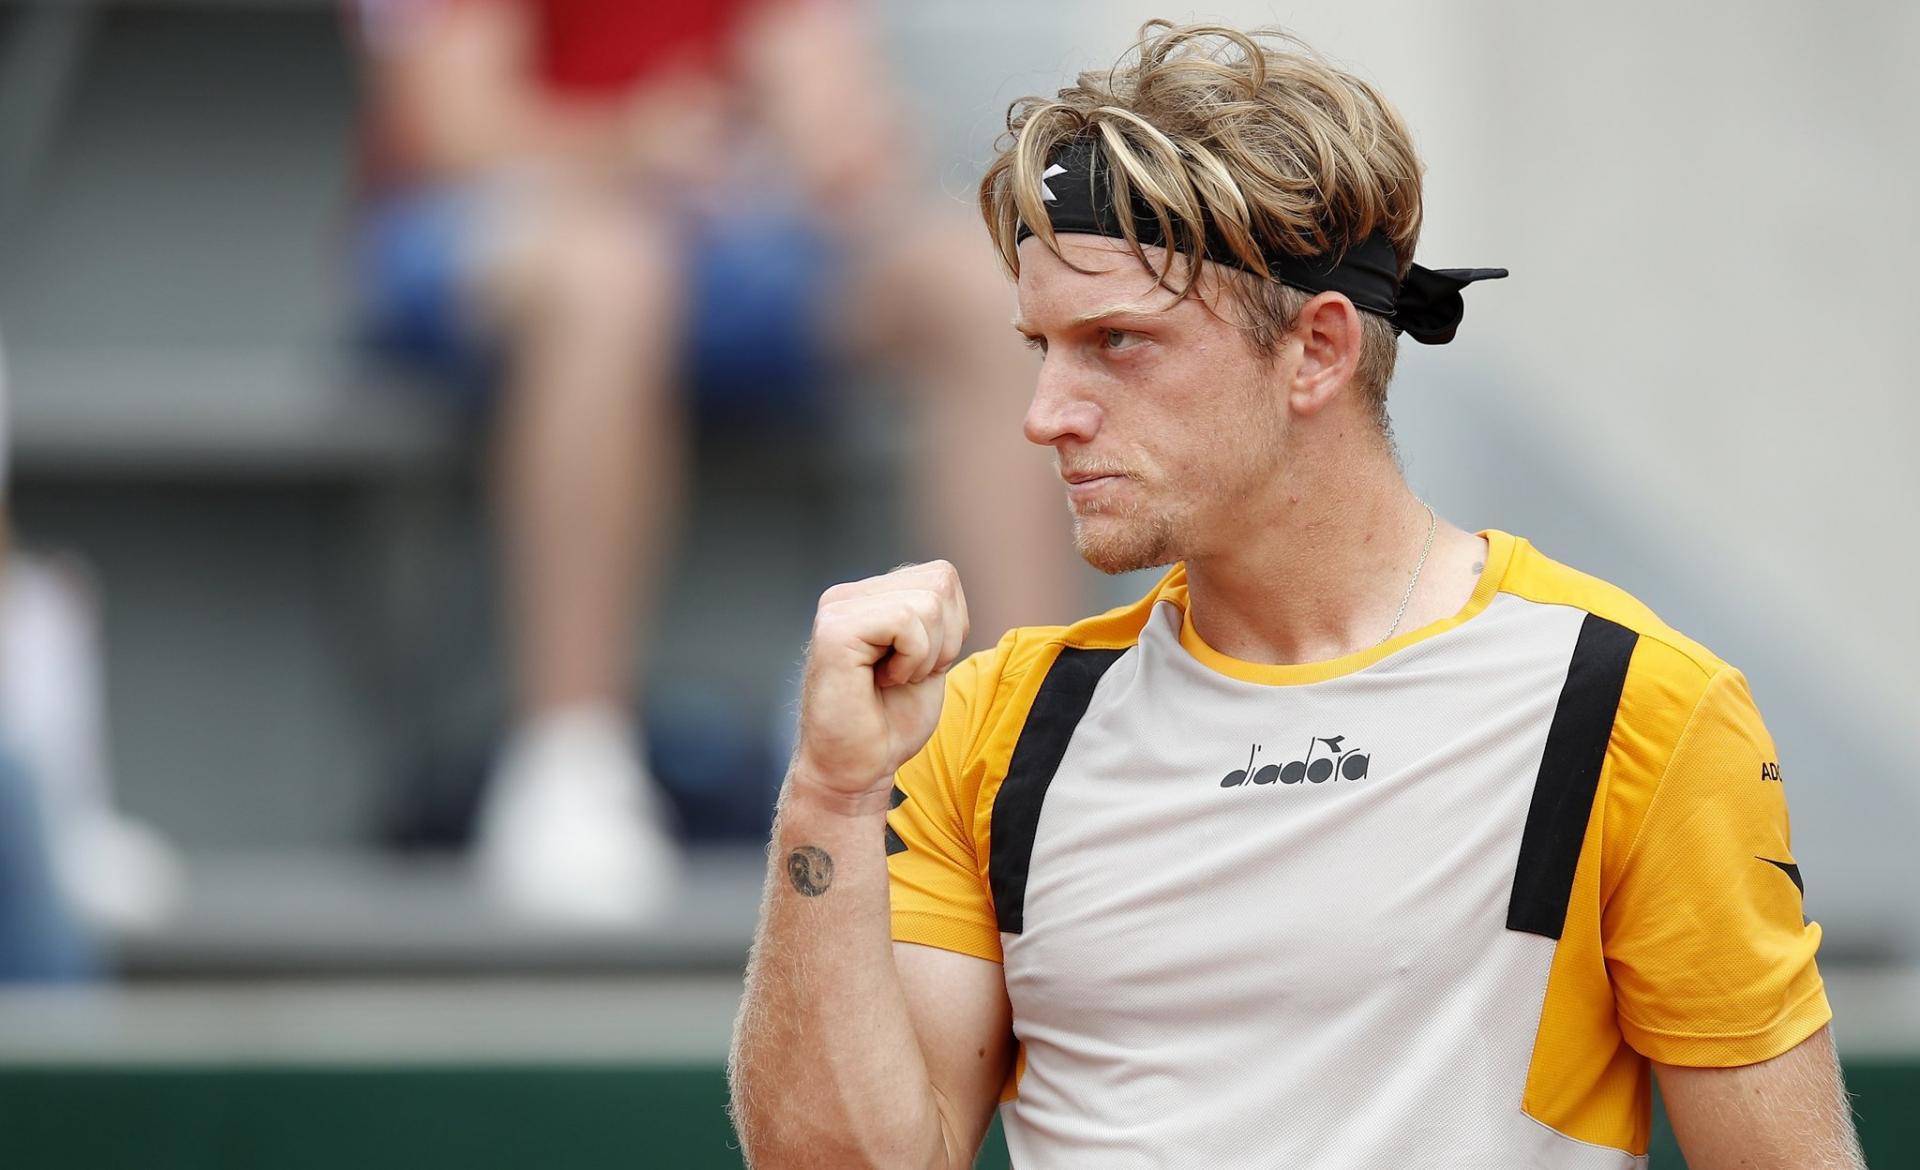 Moselle Open 2021: Alejandro Davidovich Fokina vs. Gilles Simon Tennis Pick and Prediction